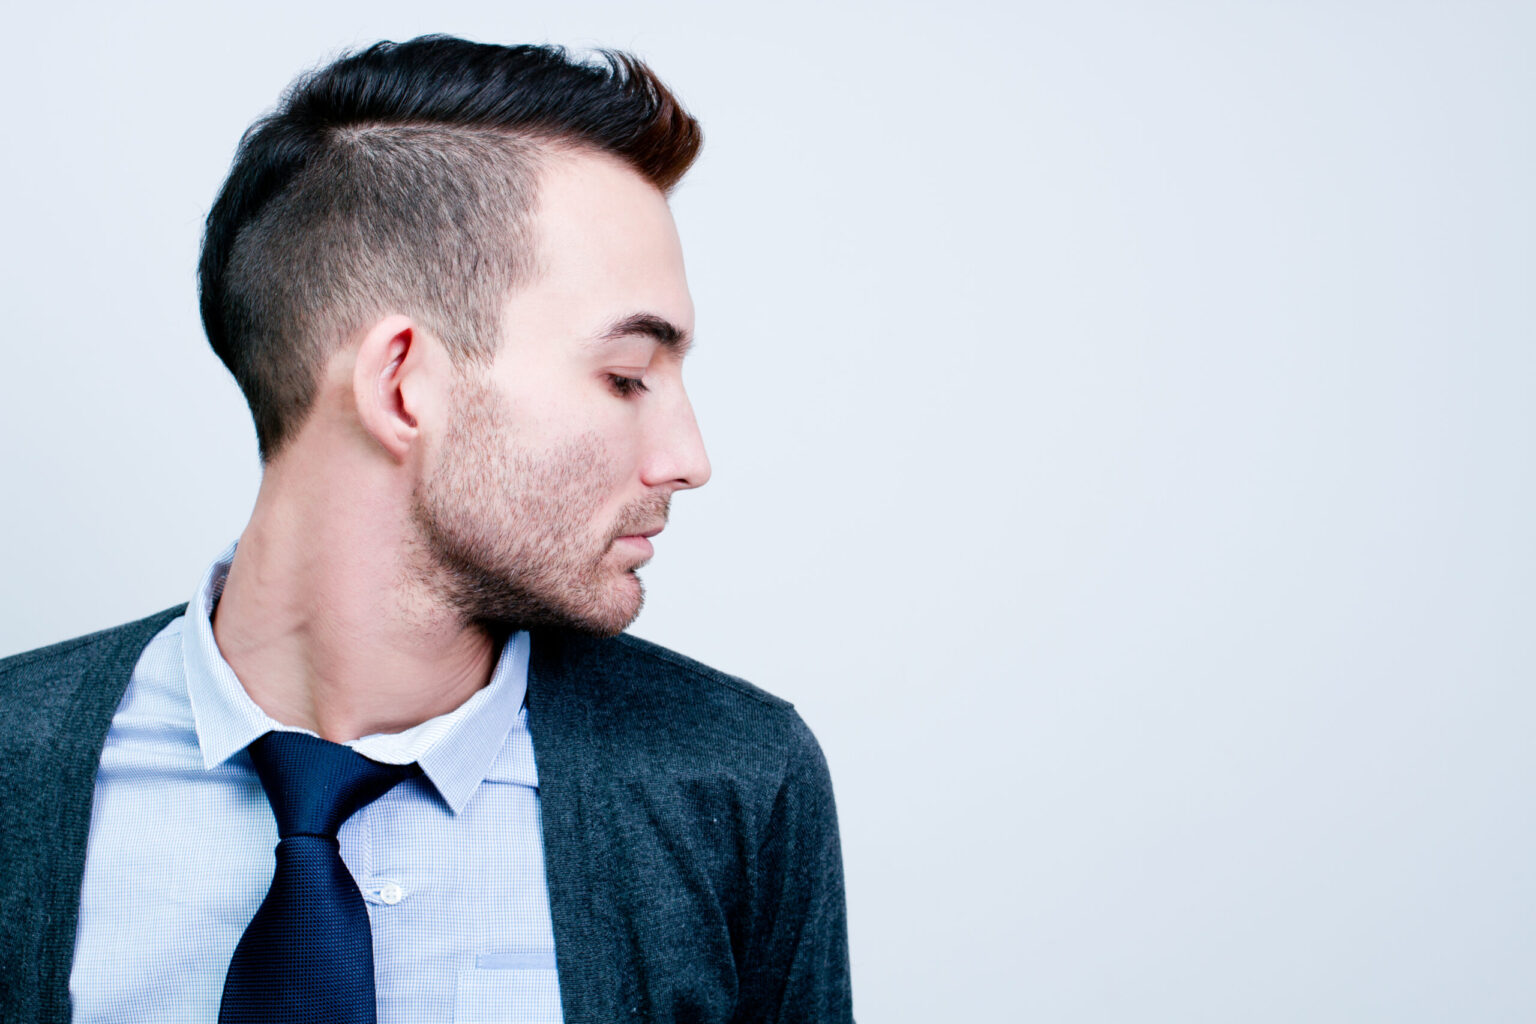 Men's mohawk haircut